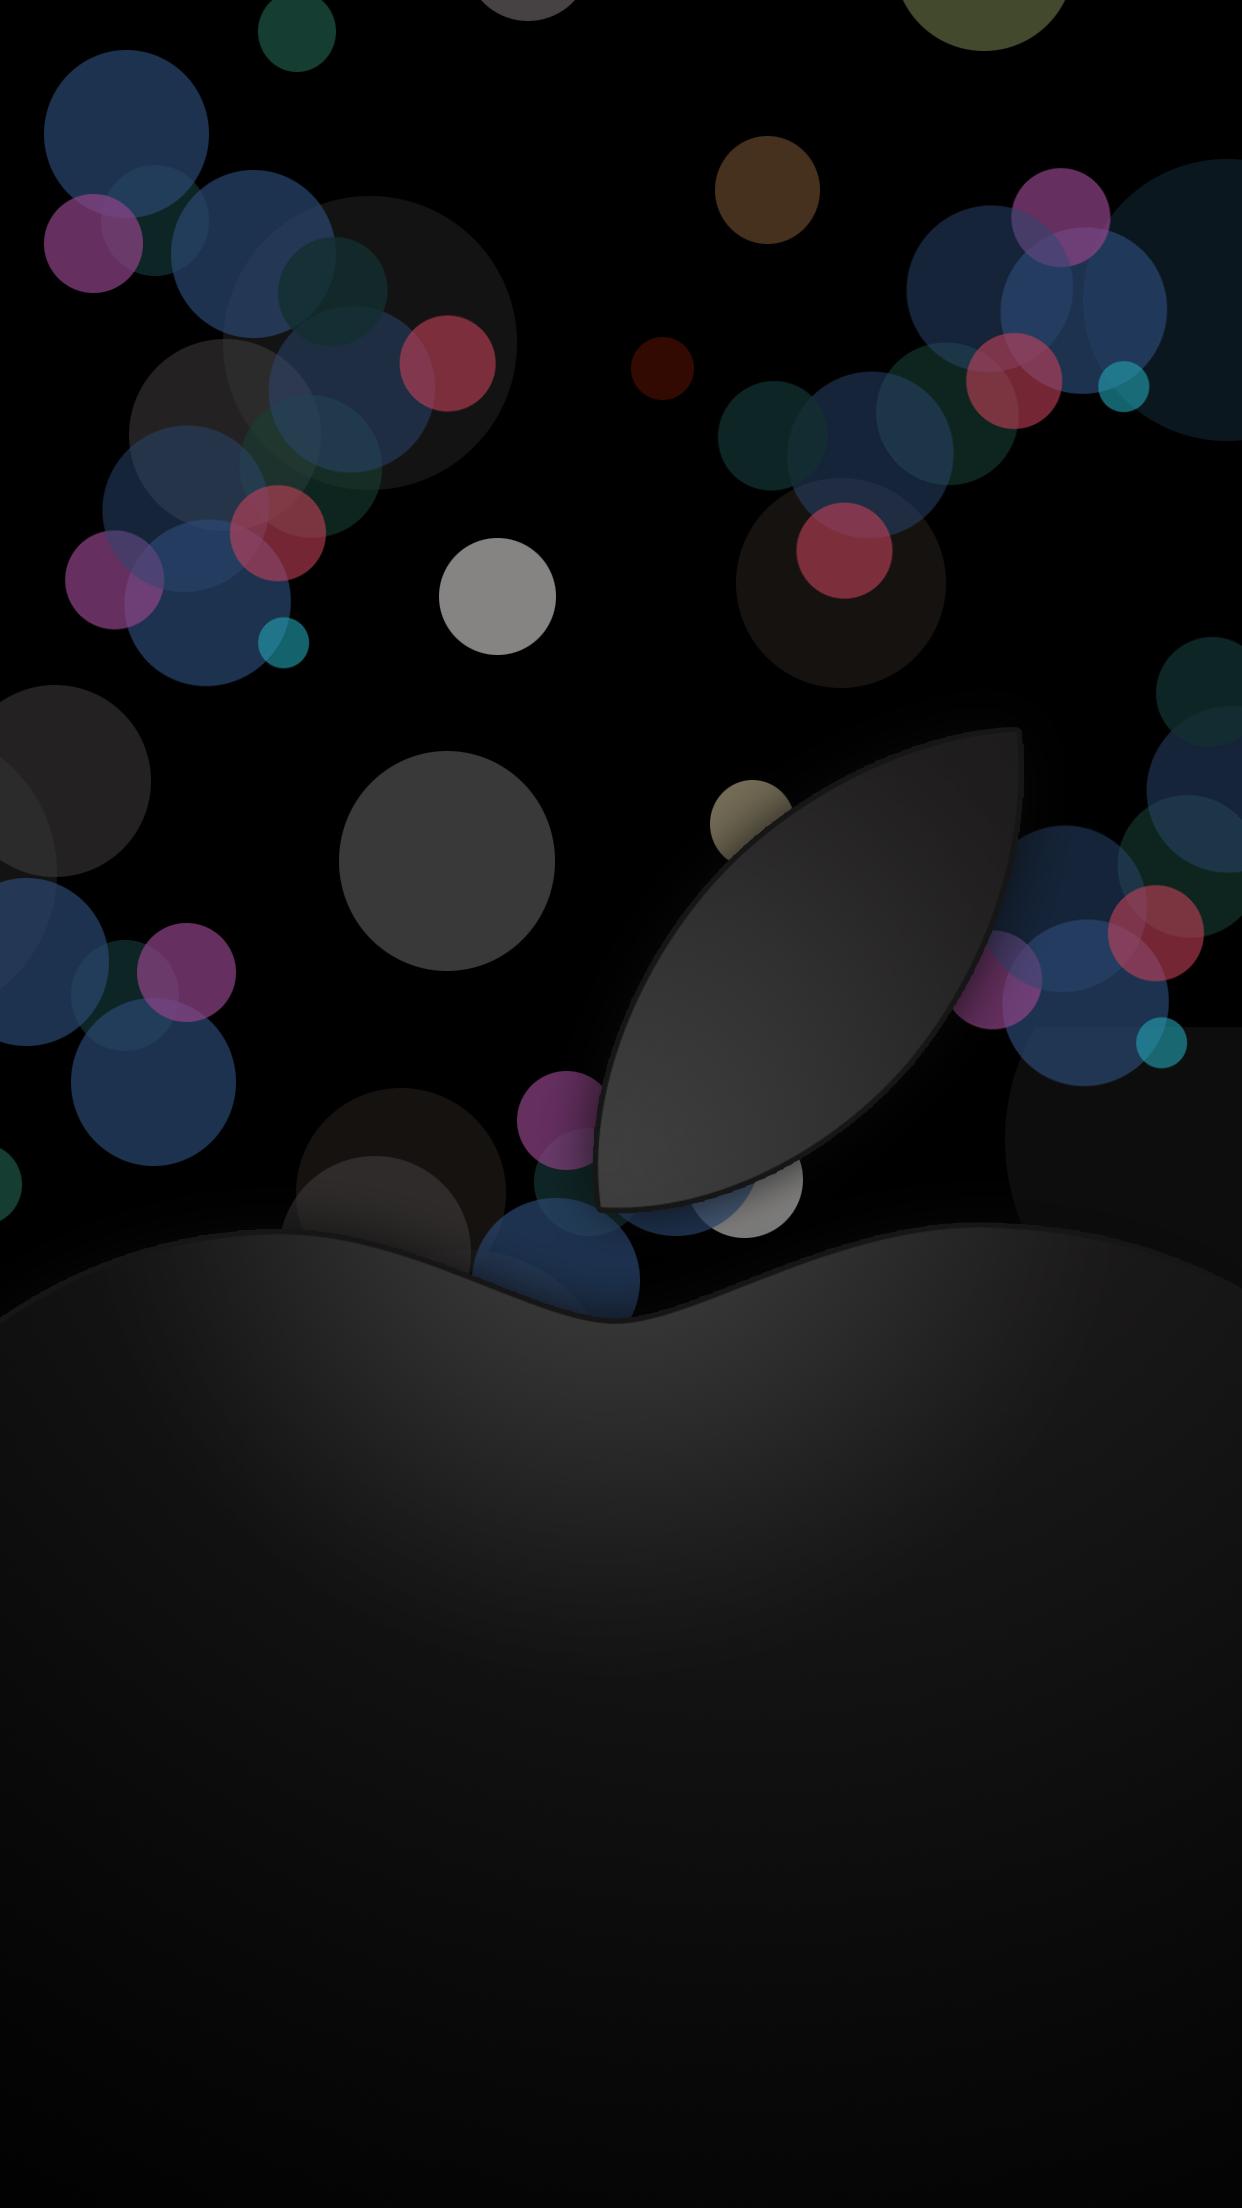 Iphone 7発表 スペシャルイベントの画像を使った壁紙 噂のappleフリークス